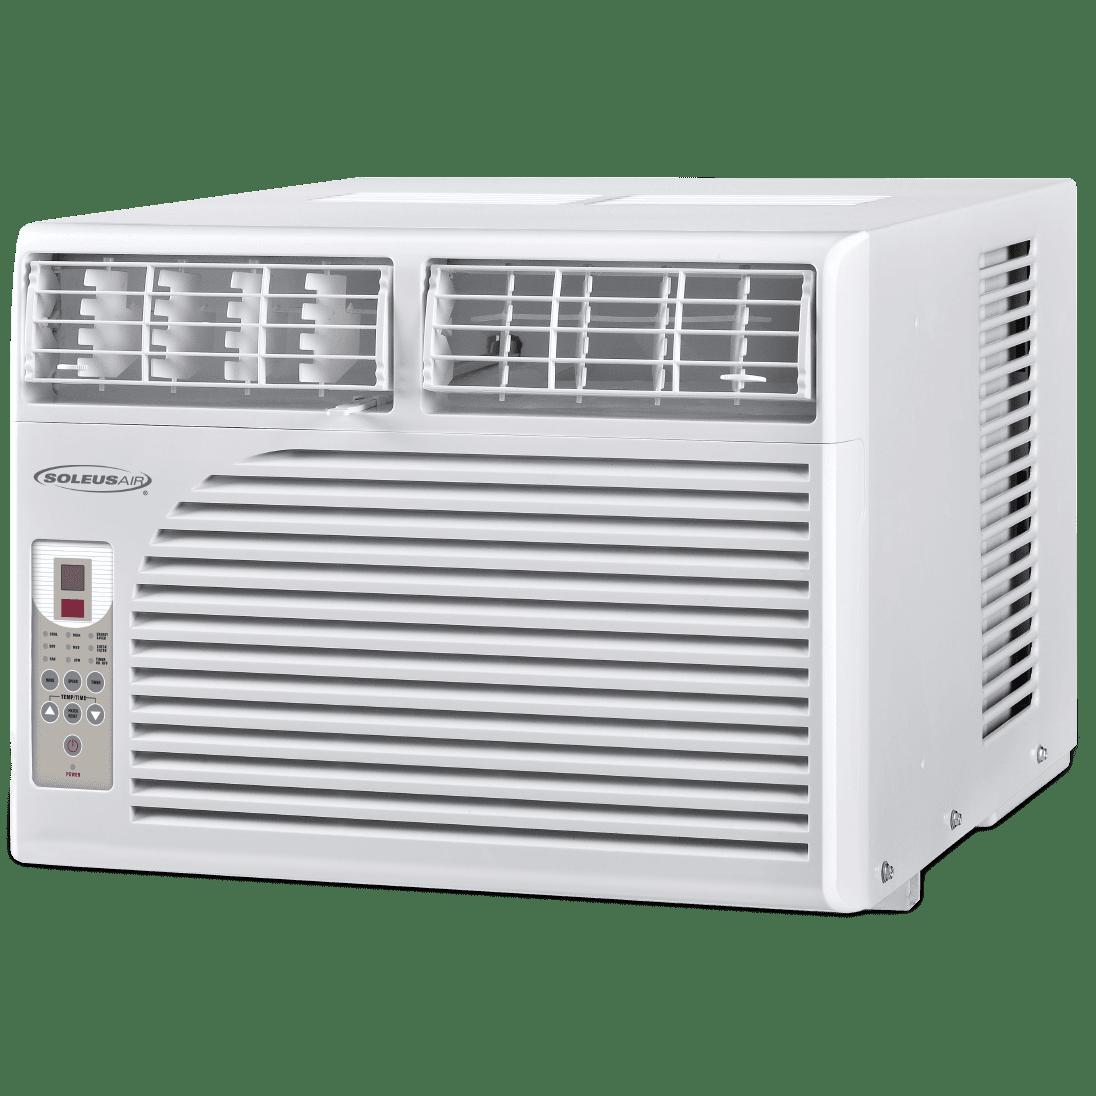 Soleus Air HCC-W08ES-A1 8,000 BTU Window Air Conditioner so3785